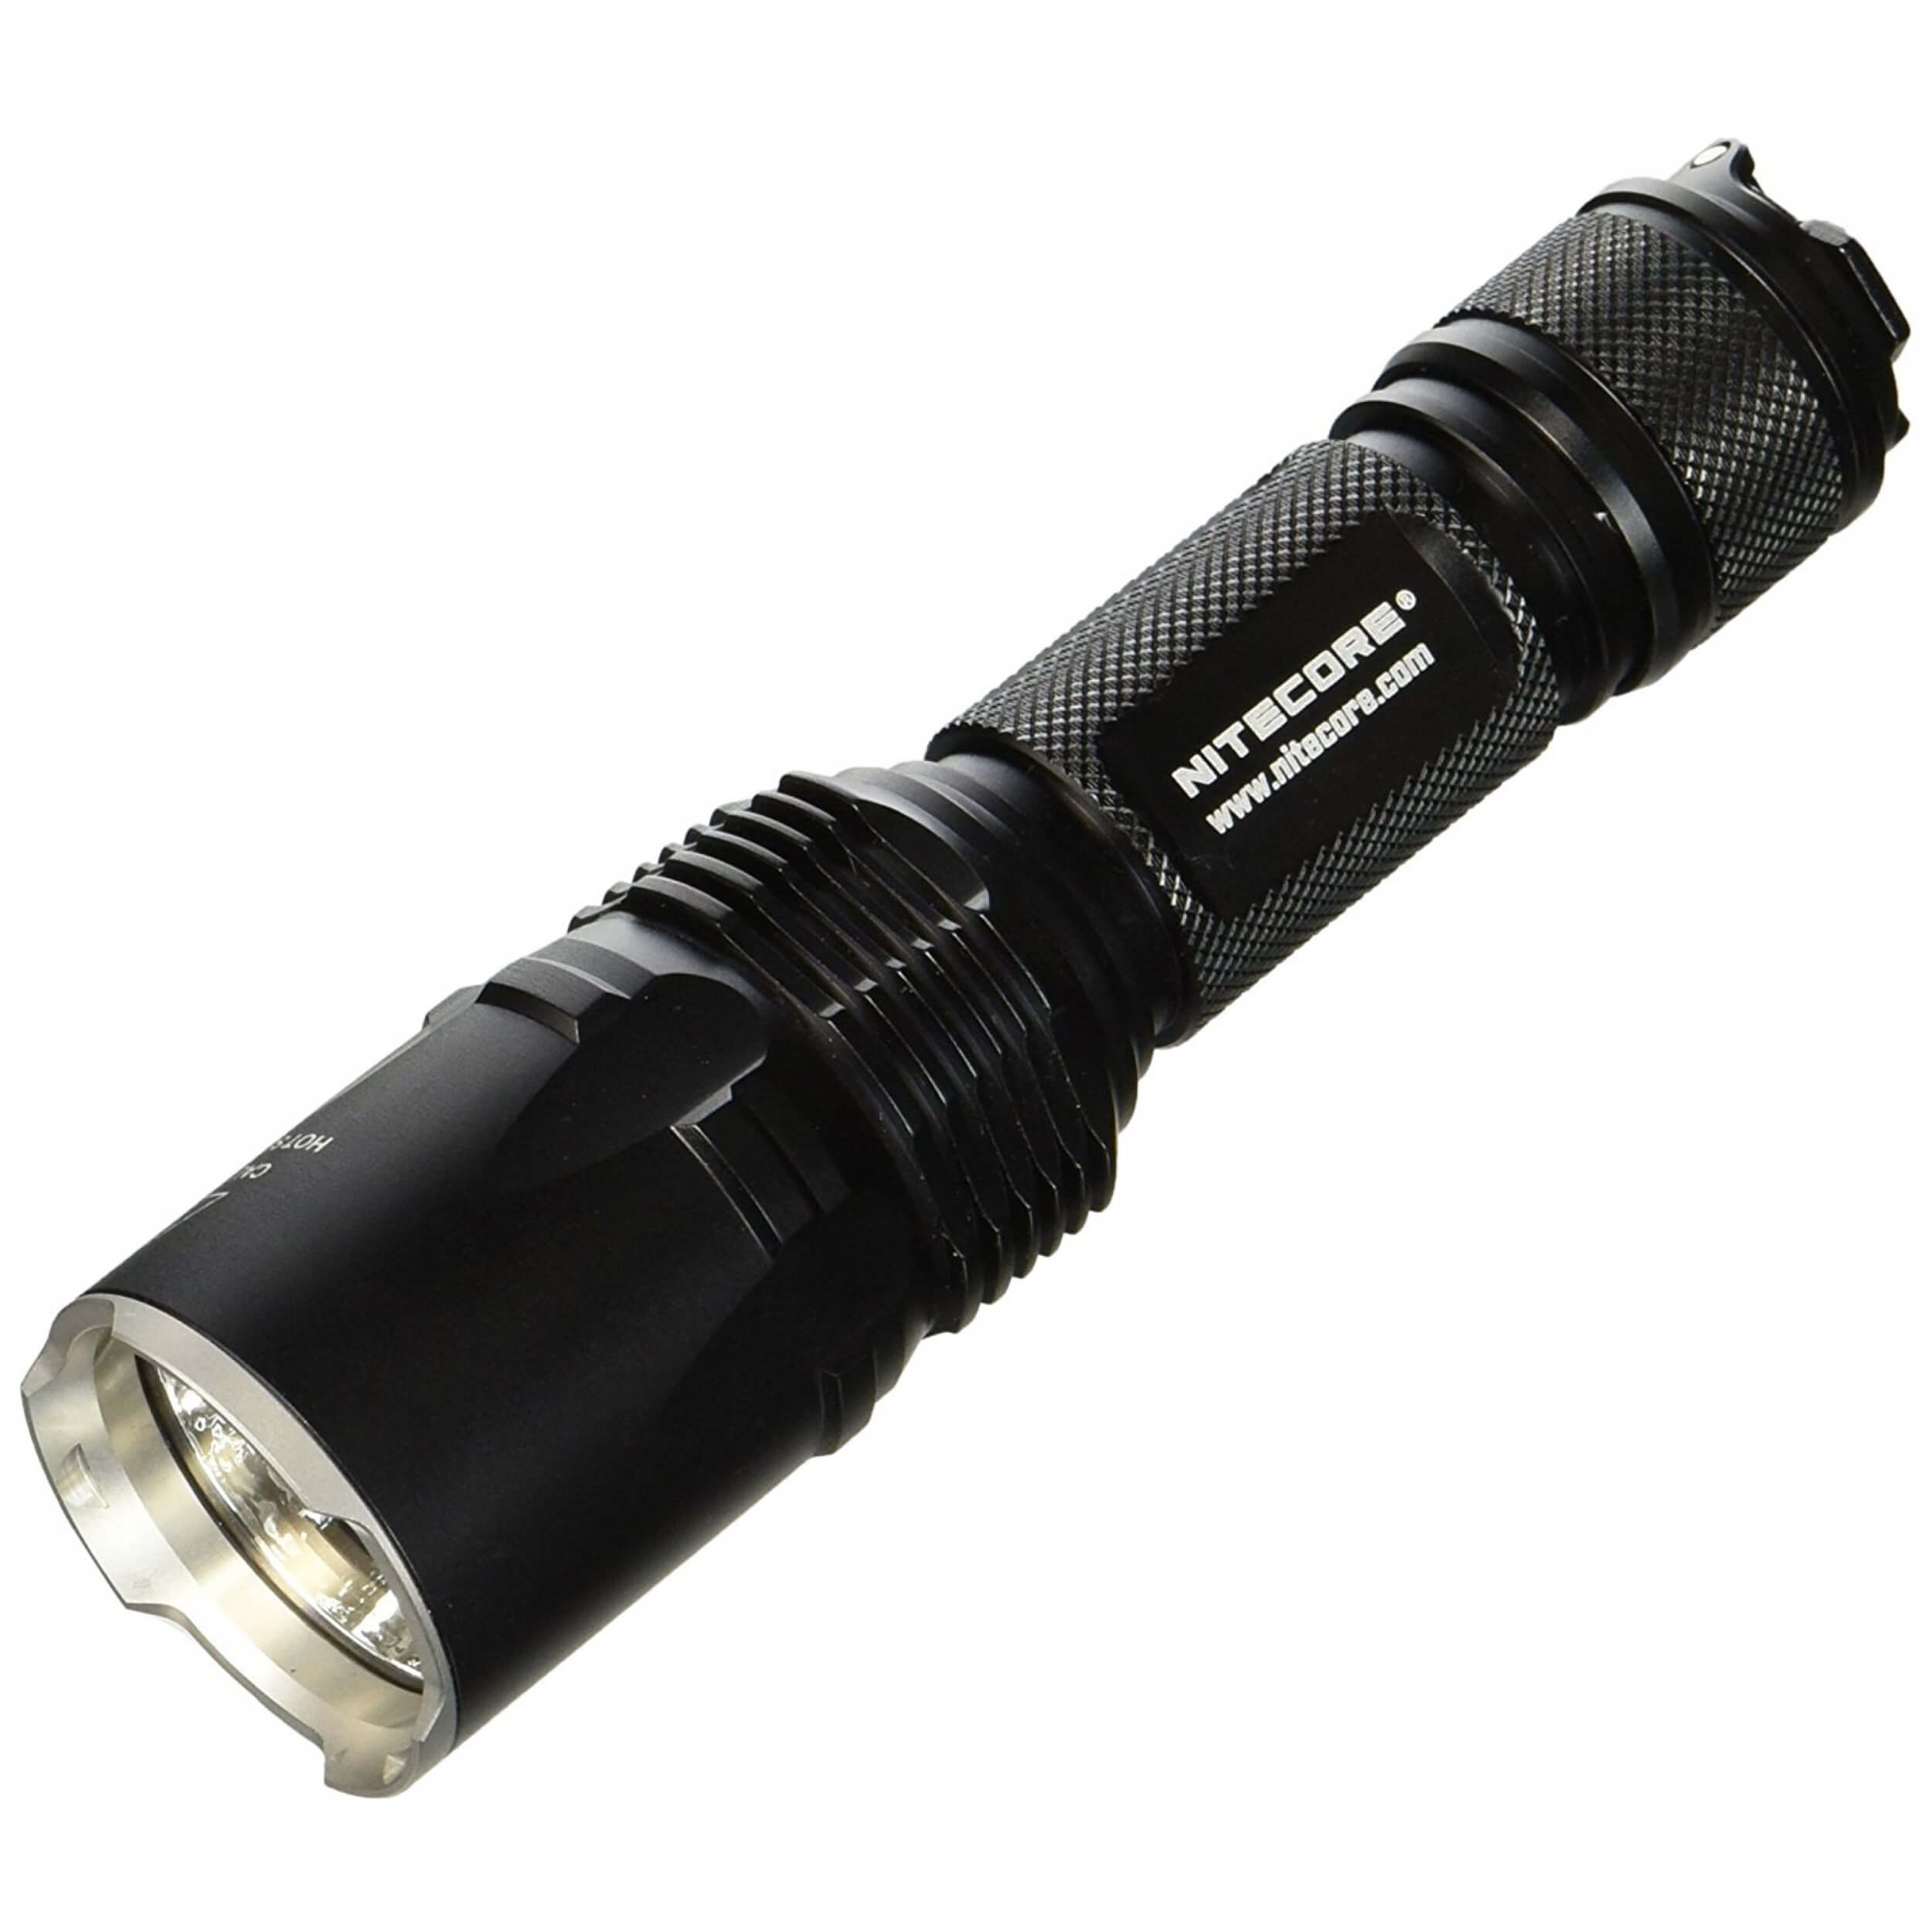 NiteCore TM03 2800 Lumen